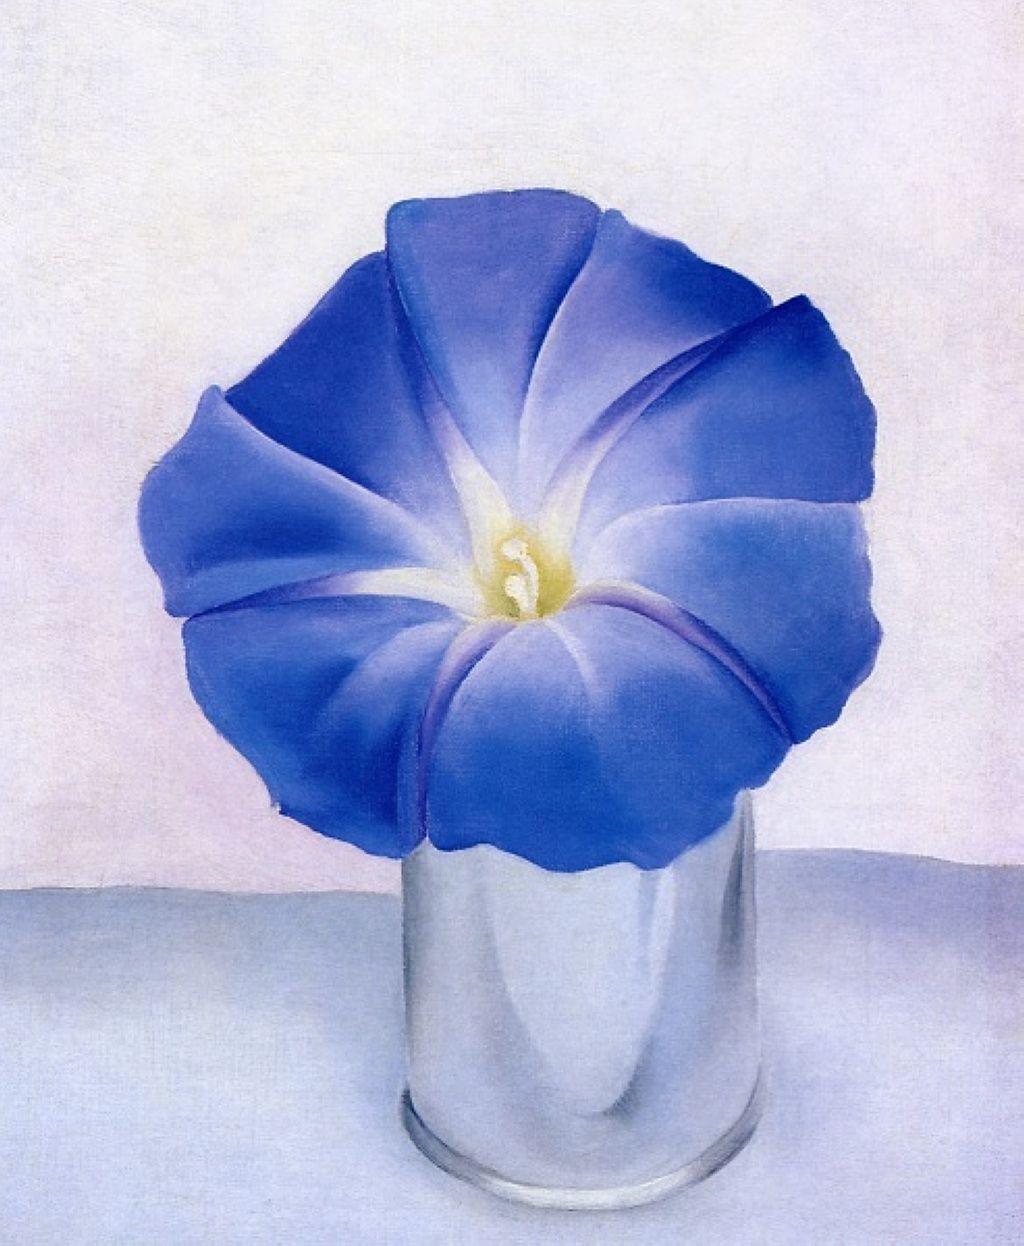 Blue Morning Glory ~ Georgia O'Keeffe